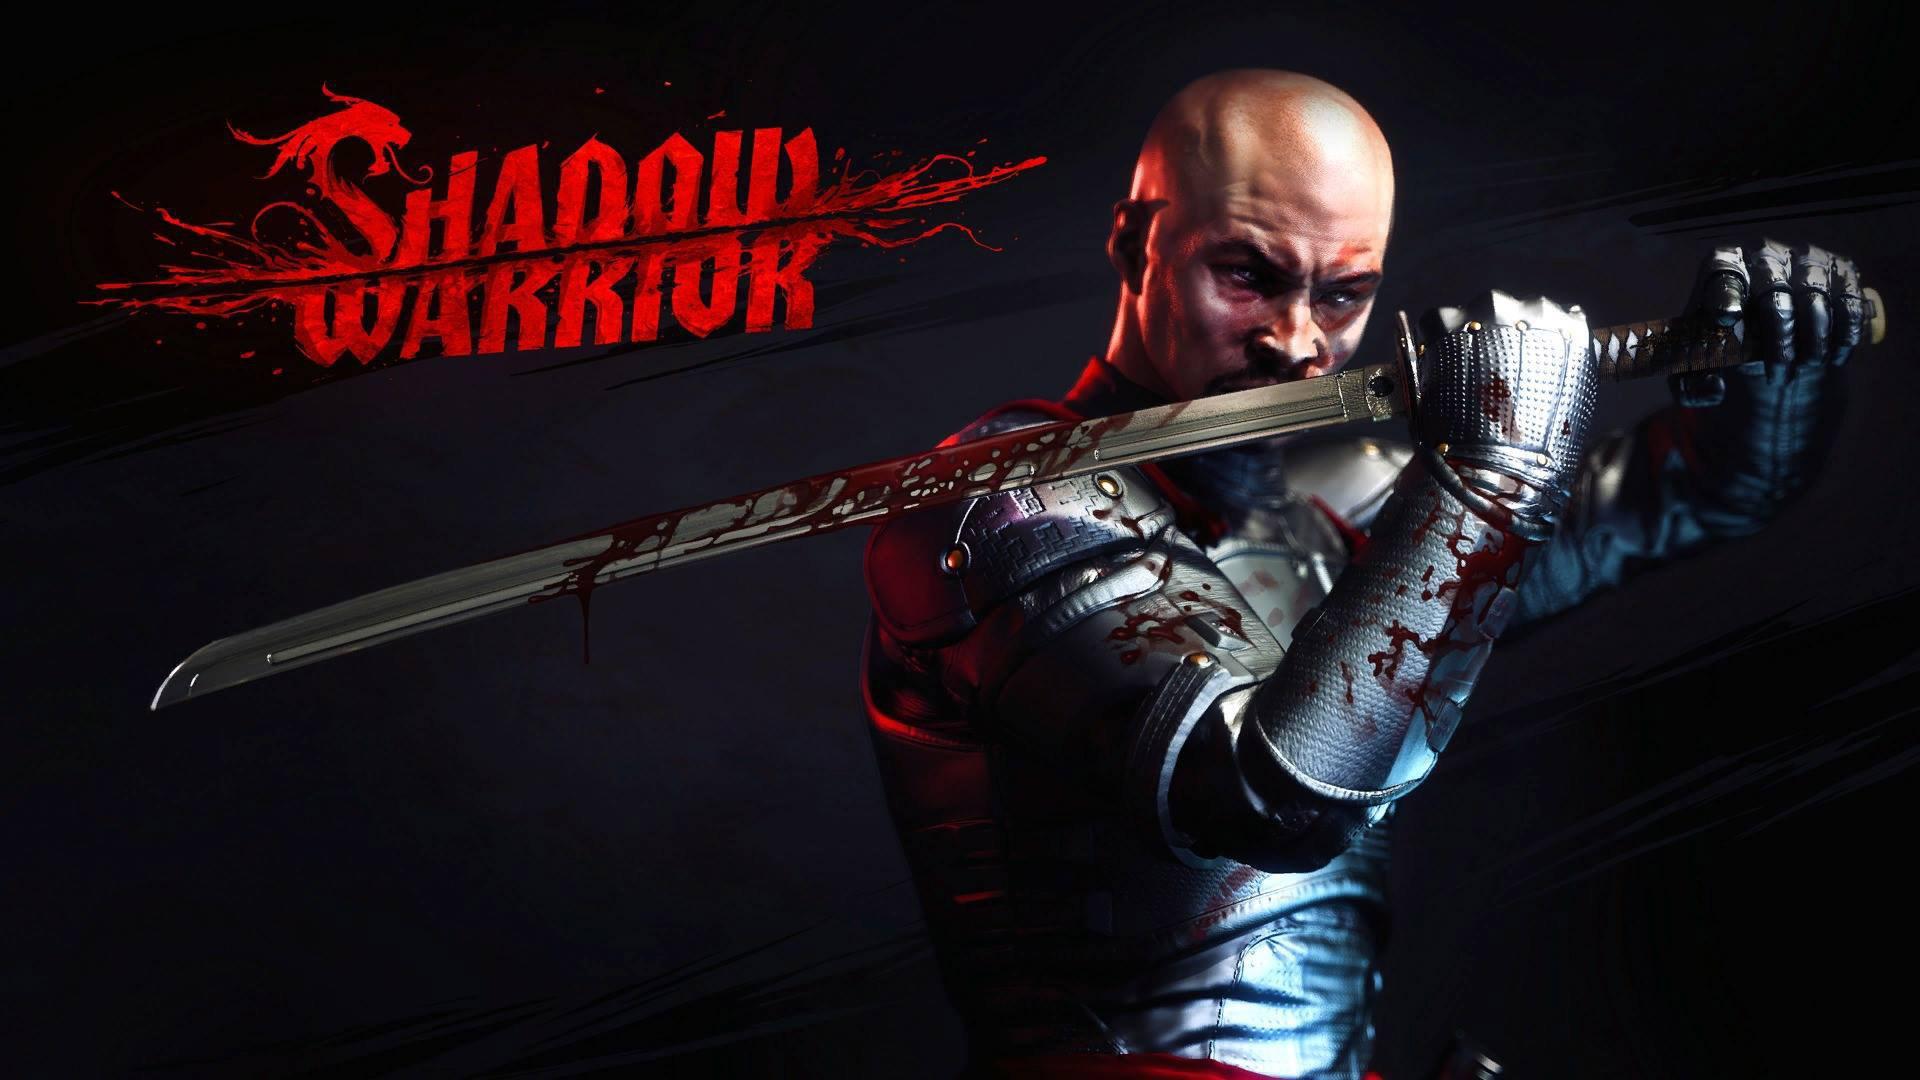 Shadow Warrior wallpaper 1